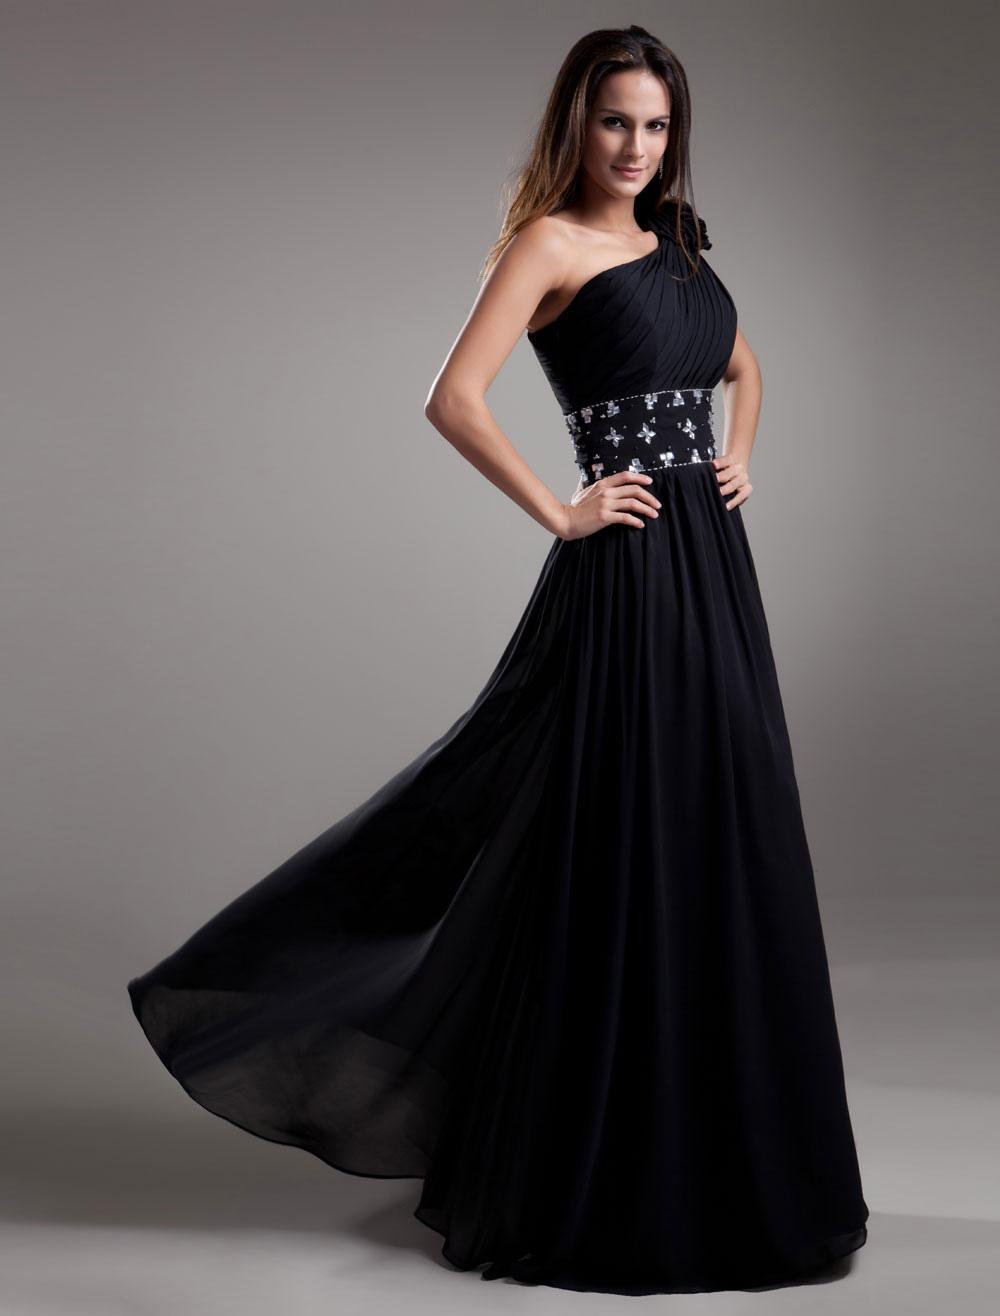 Formal Black Chiffon One-Shoulder Evening Dress (Wedding Evening Dresses) photo